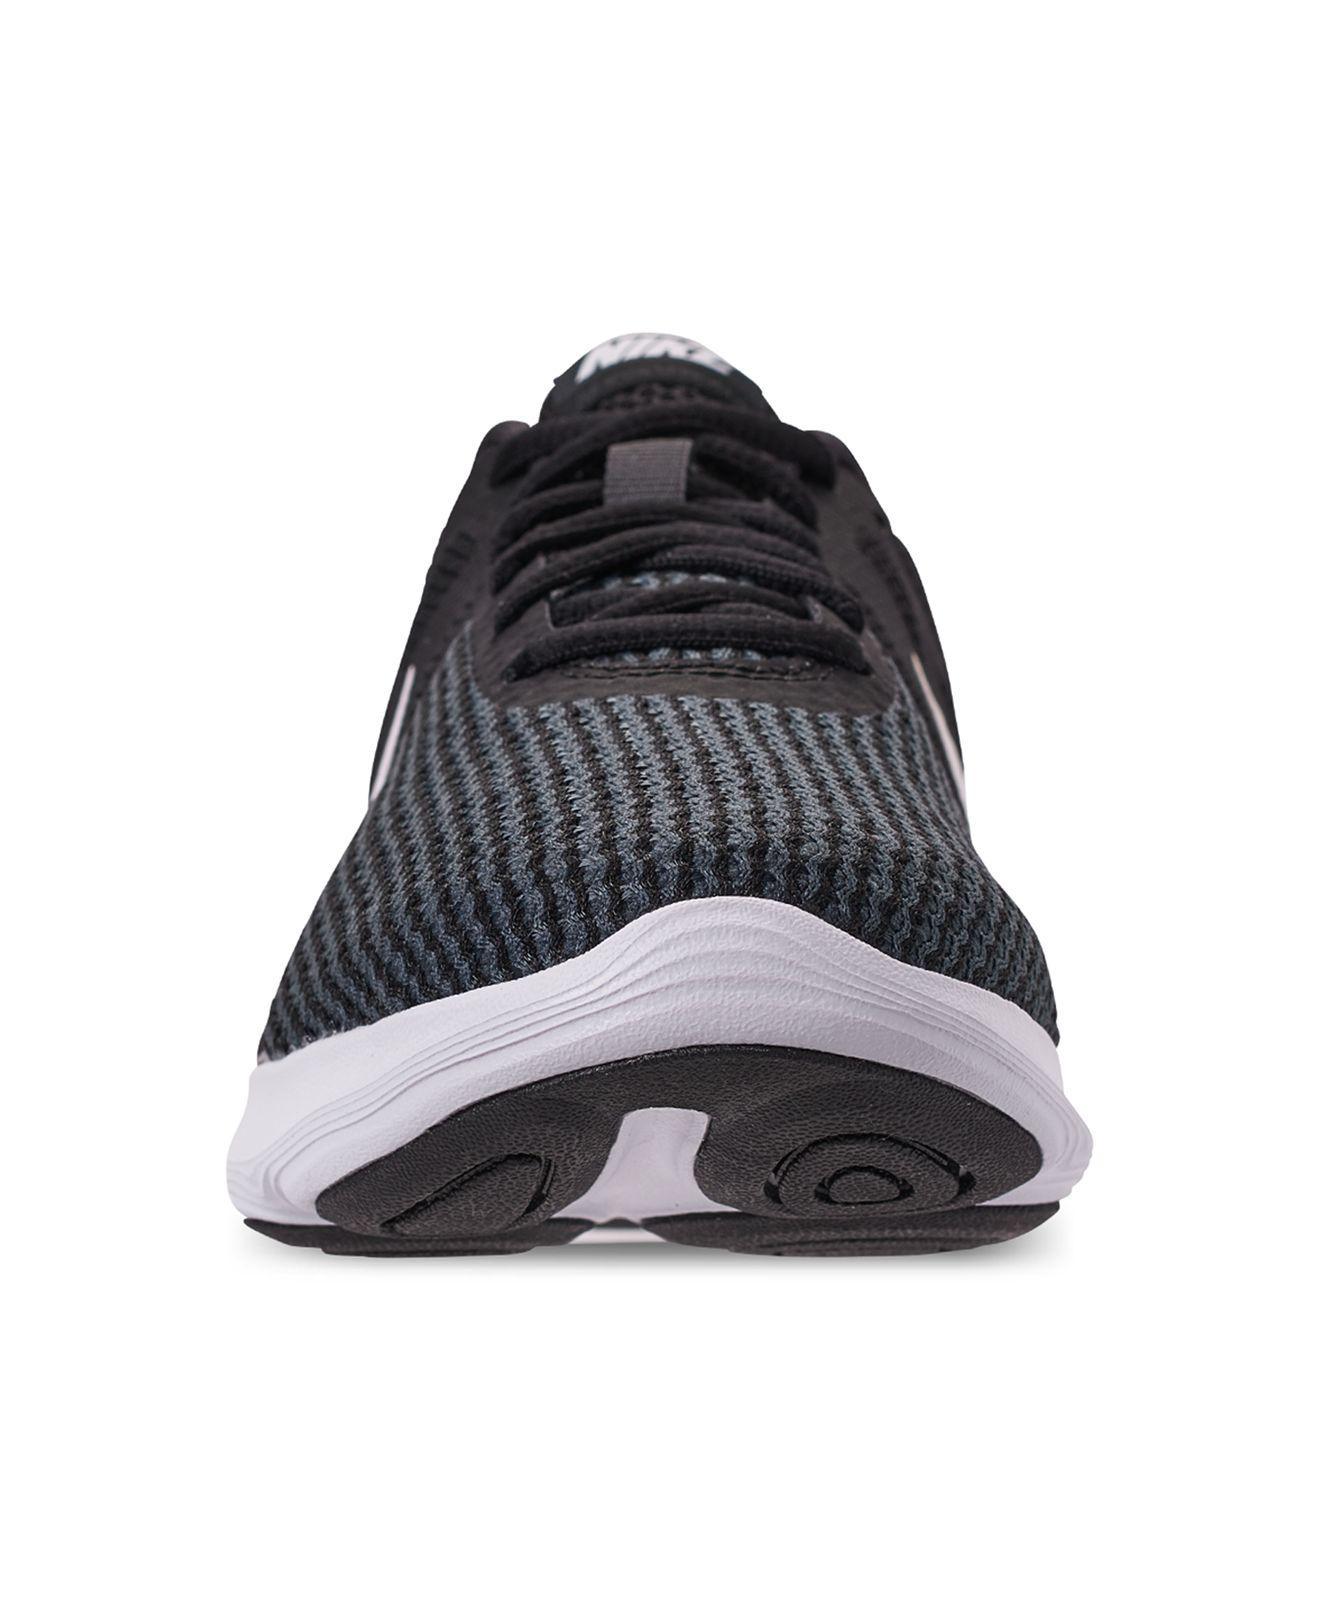 116e10b52604 Nike - Black Revolution 4 Wide Width Running Sneakers From Finish Line -  Lyst. View fullscreen